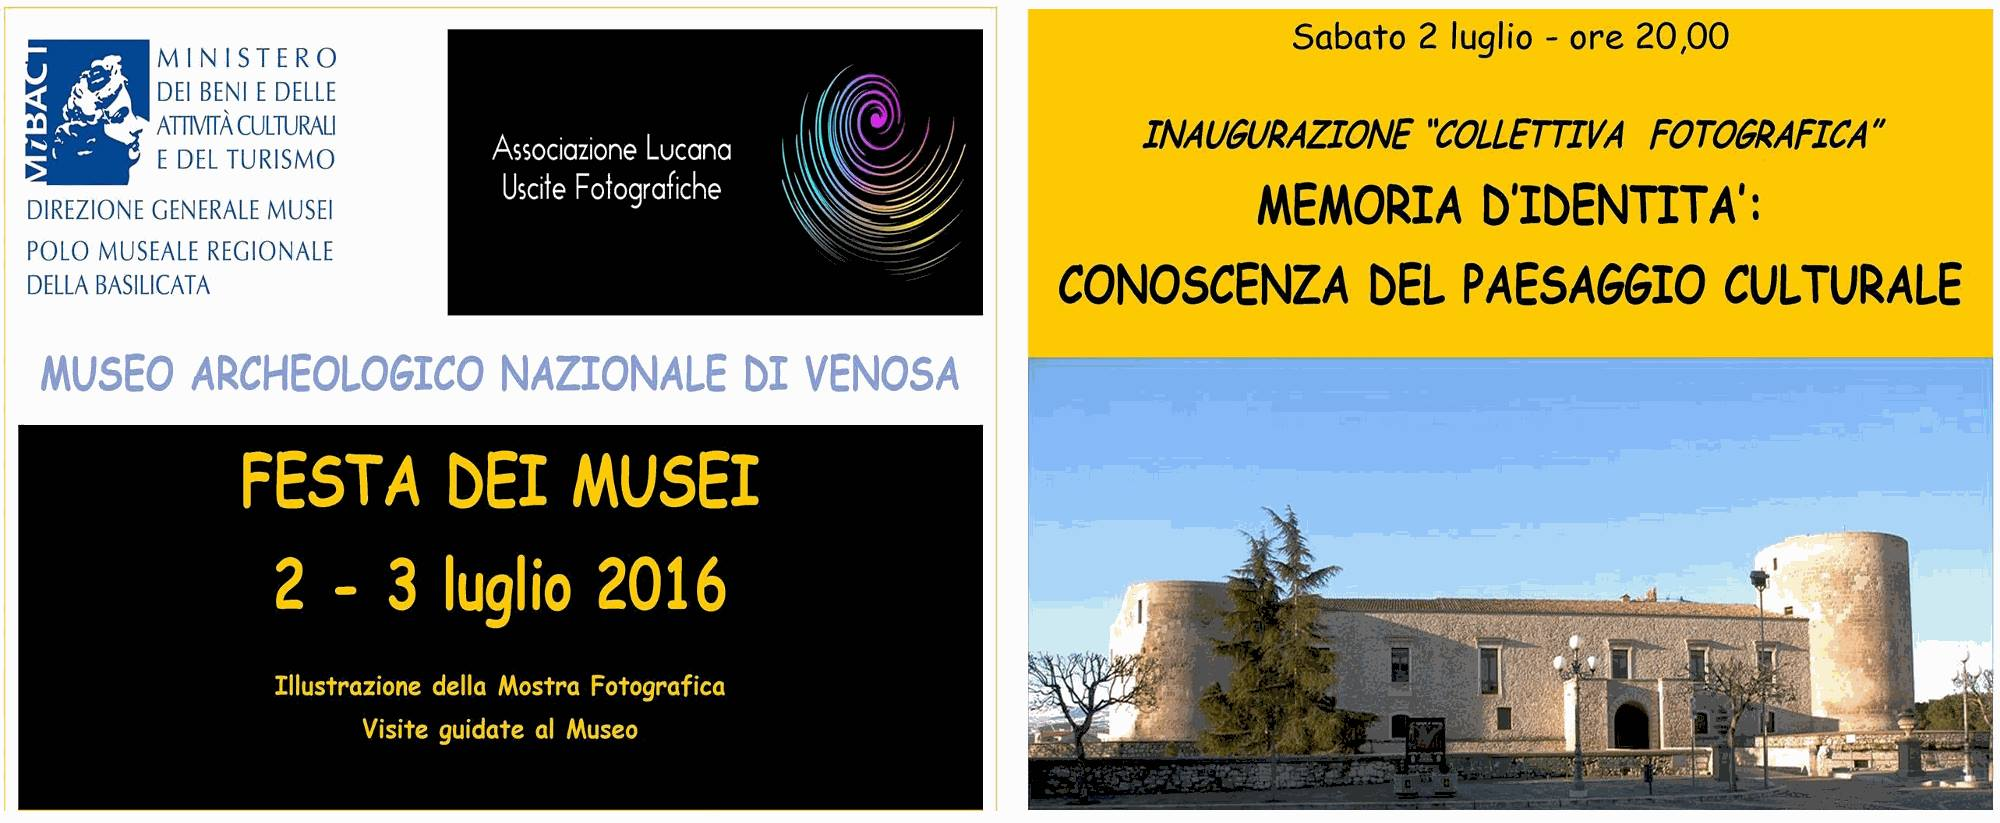 Arcobaleno B&B, potenza, basilicata, italia - Festa dei musei 2016 Venosa